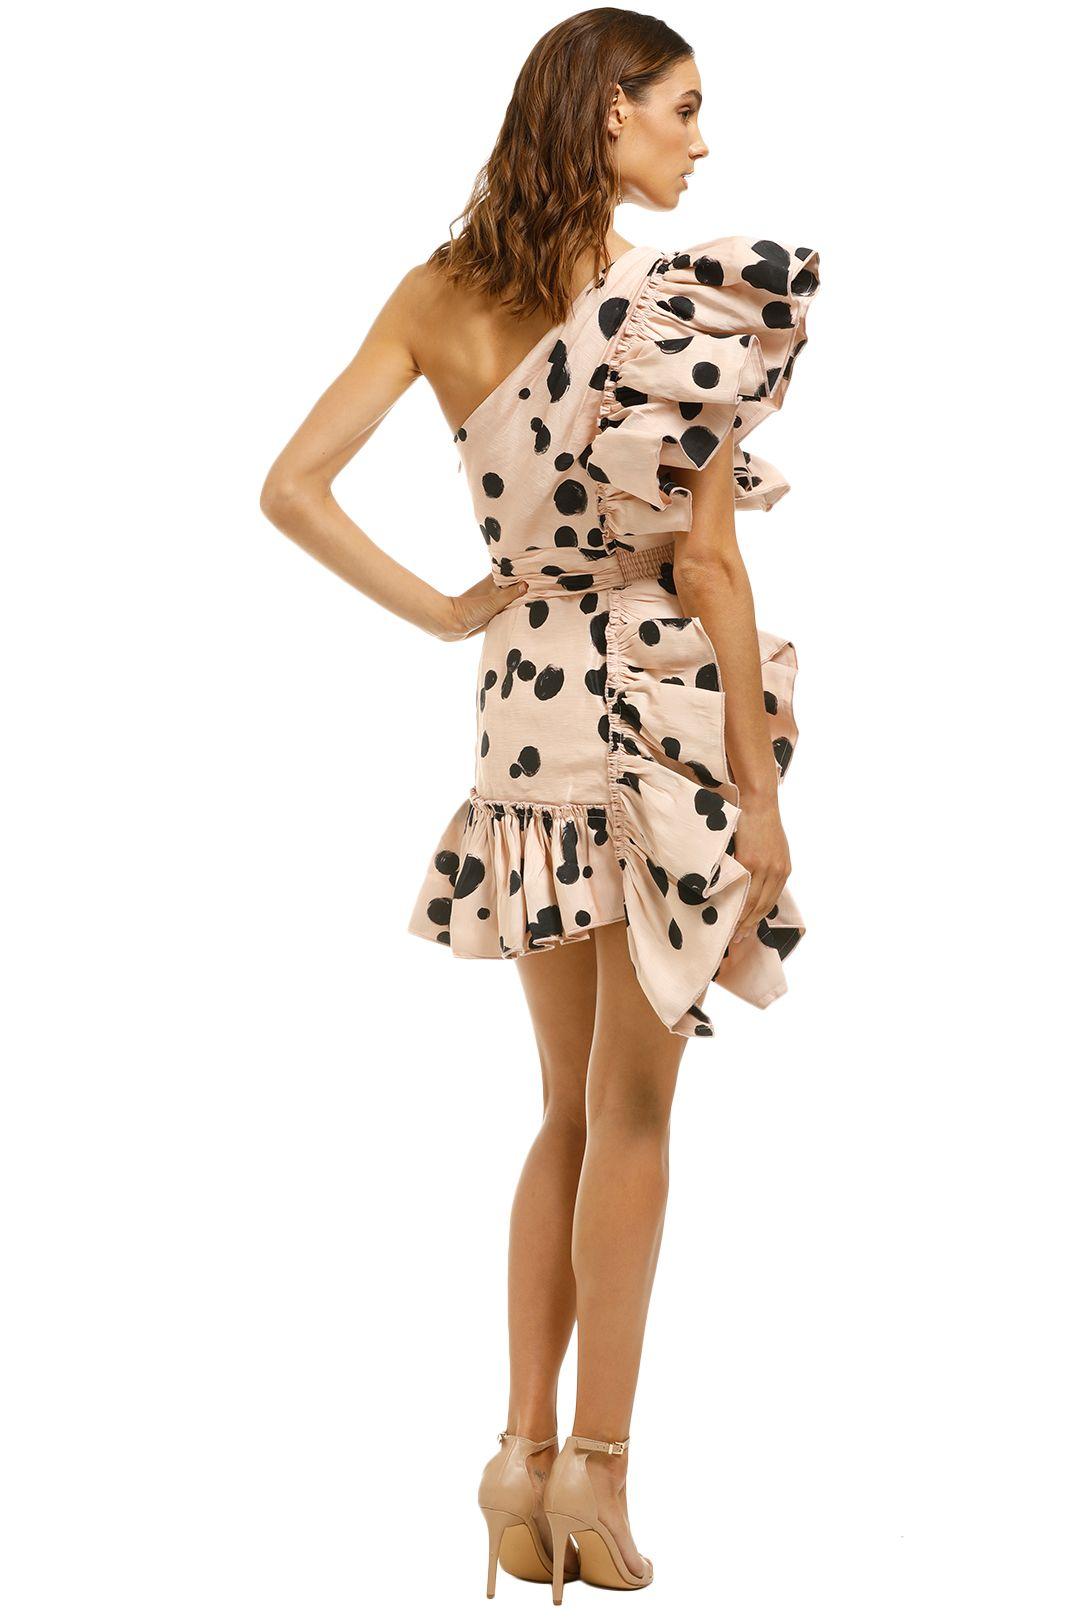 AJE-Beronia-Dress-Nude-Spot-Back